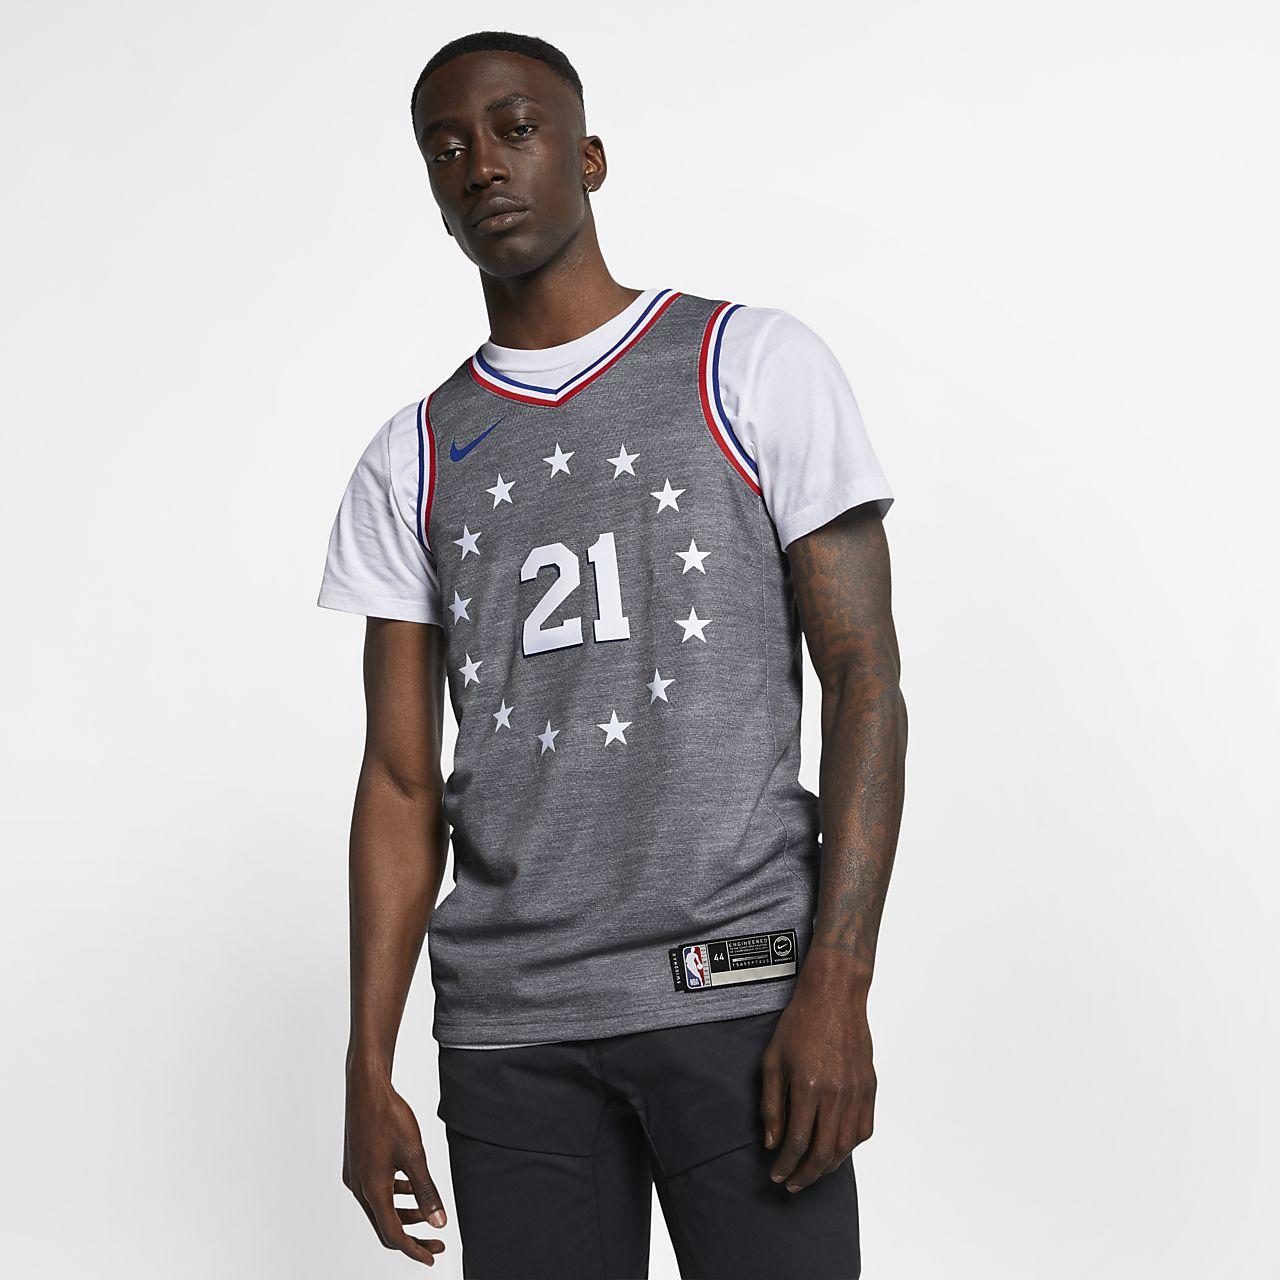 camisetas nike hombre ca365ffb8b - sajadjafari.com f6fbca878b6